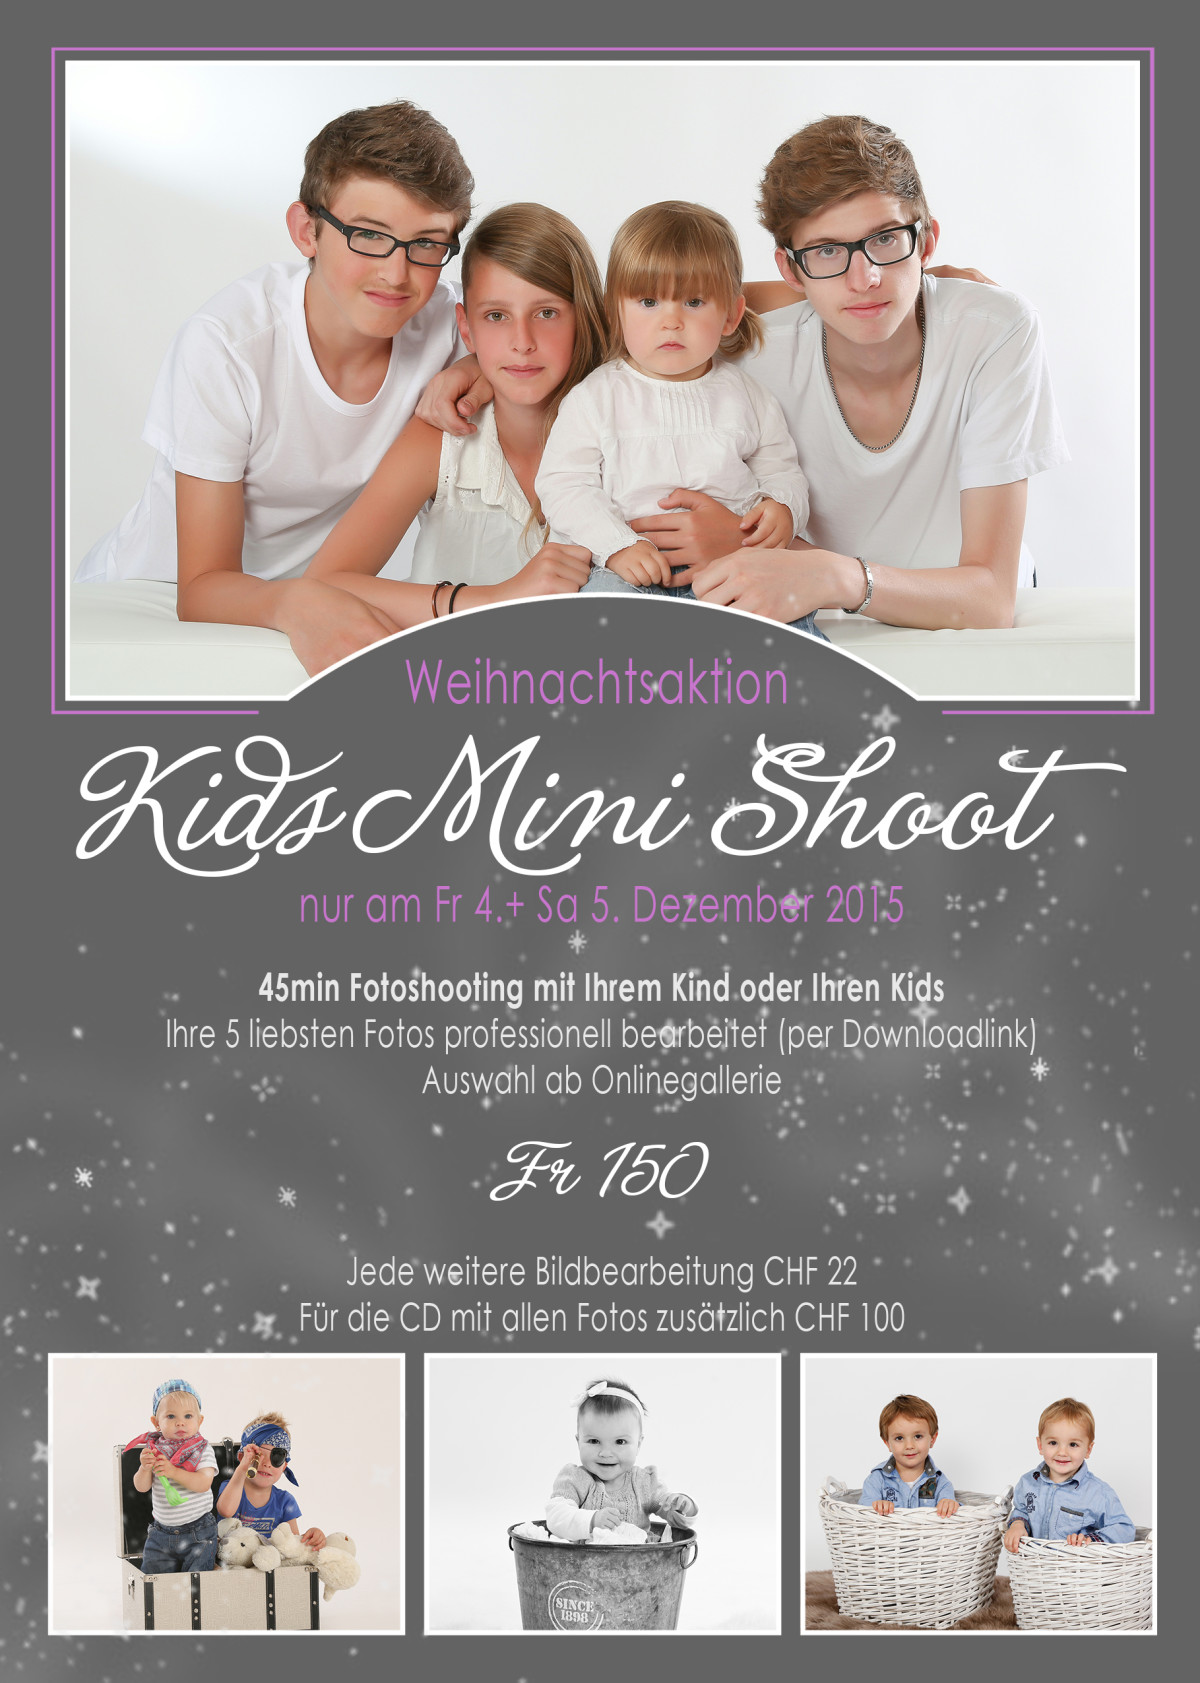 Kids_Weihnachtsaktion2015_schöniaugeblick_Fotografie